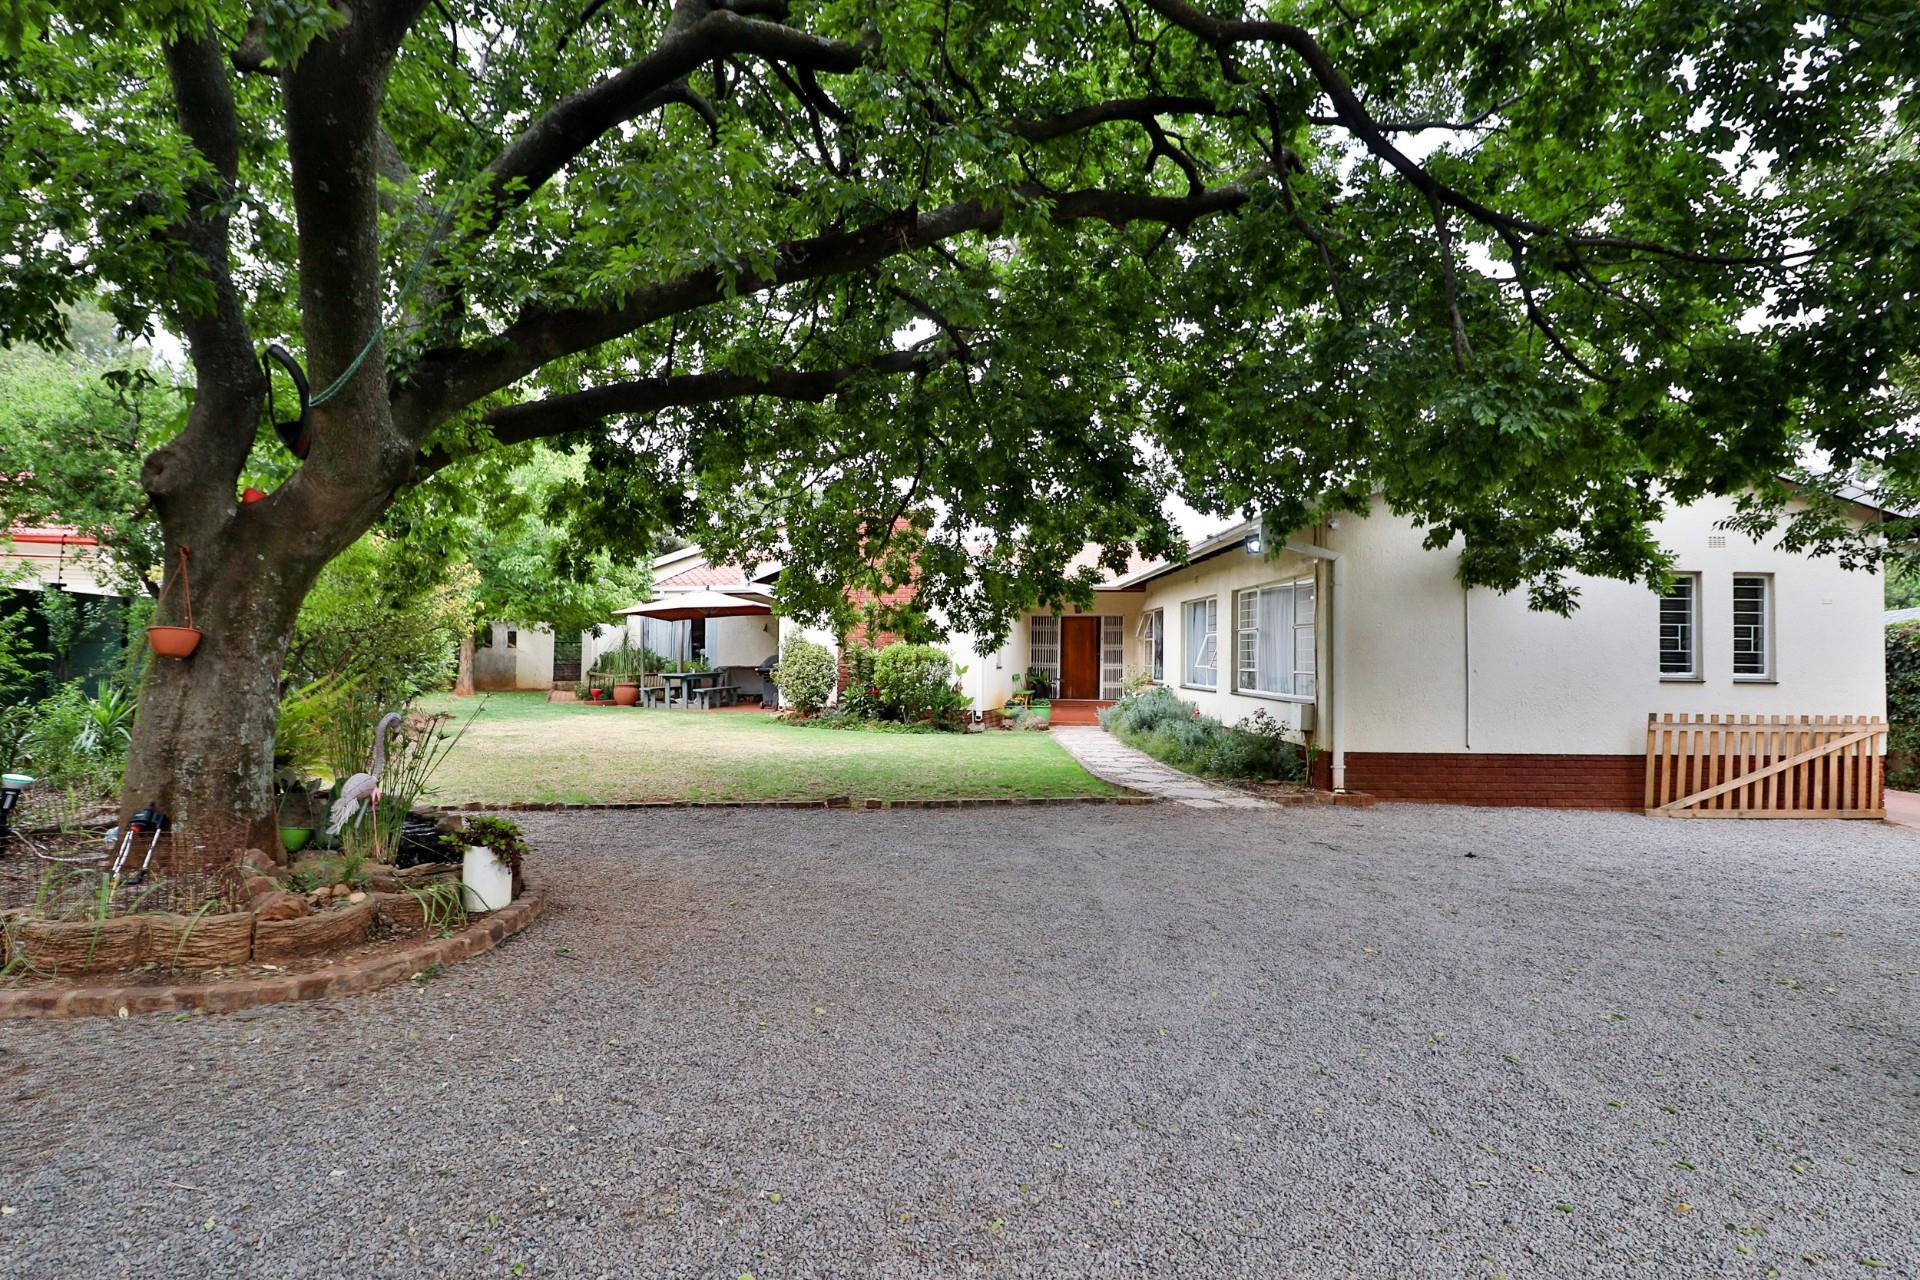 4 Bedroom House For Sale in Windsor Glen